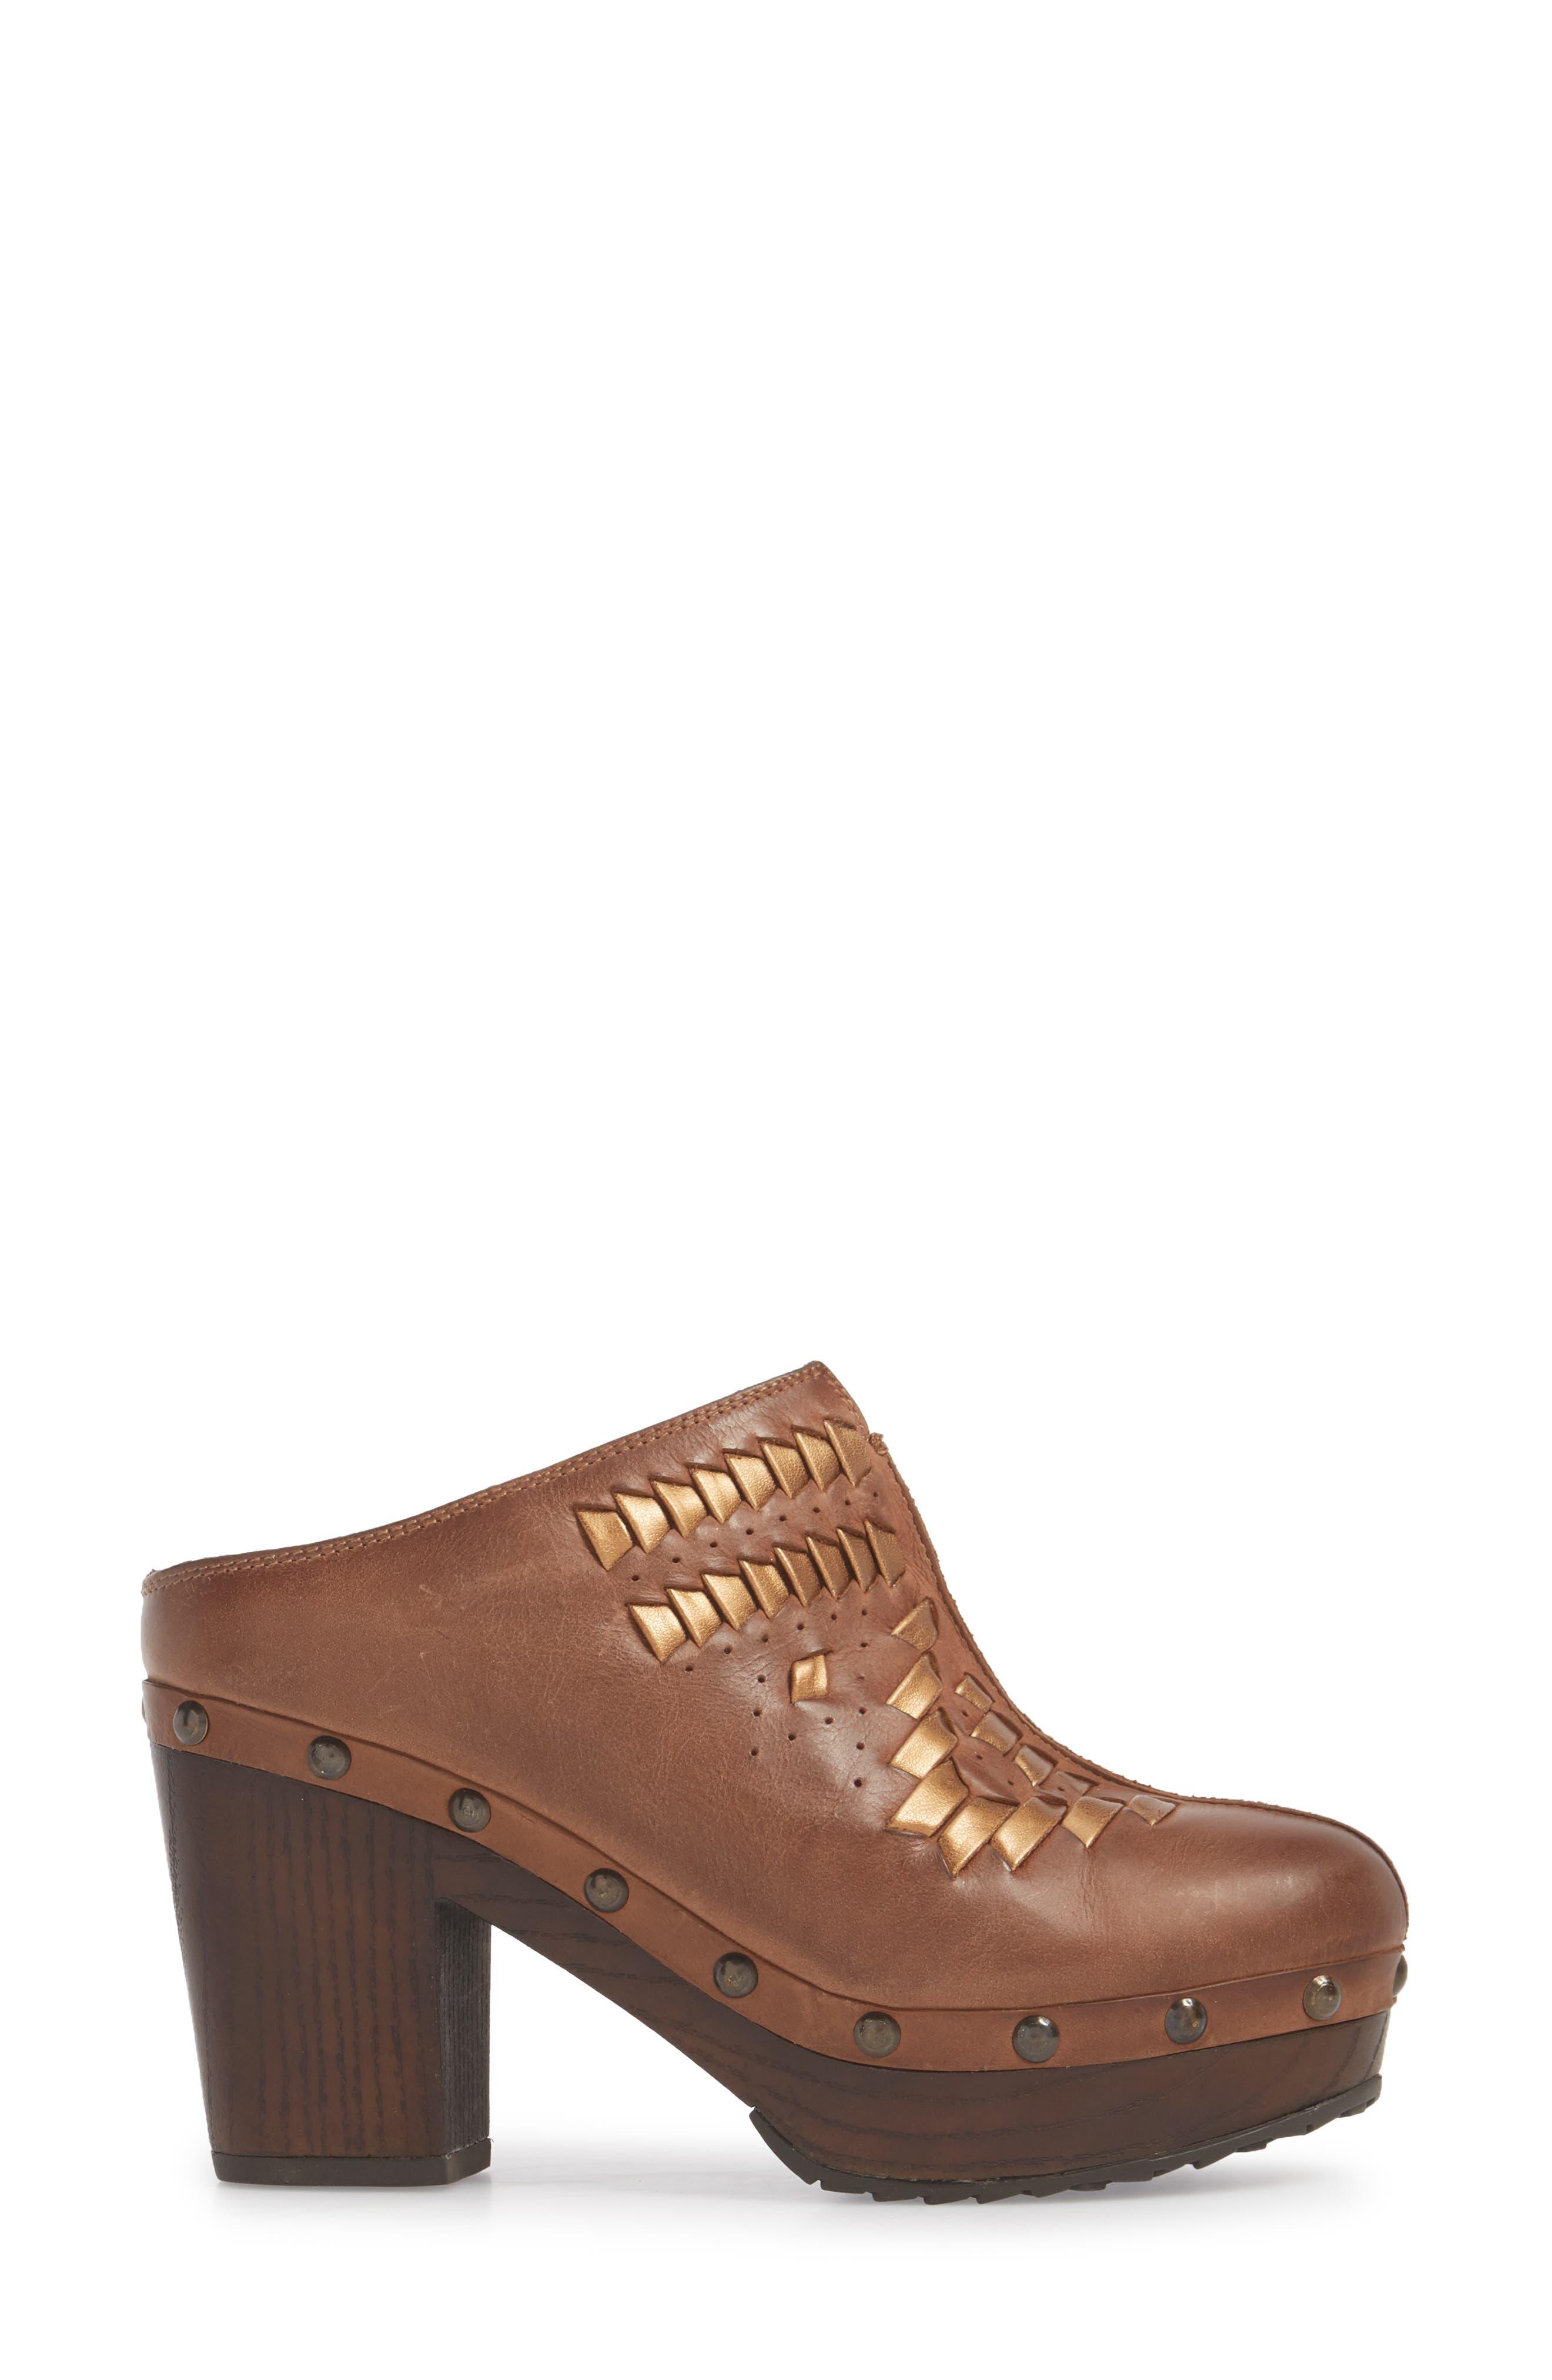 Bria Platform Clog,                             Alternate thumbnail 3, color,                             Bronzed Brown Leather